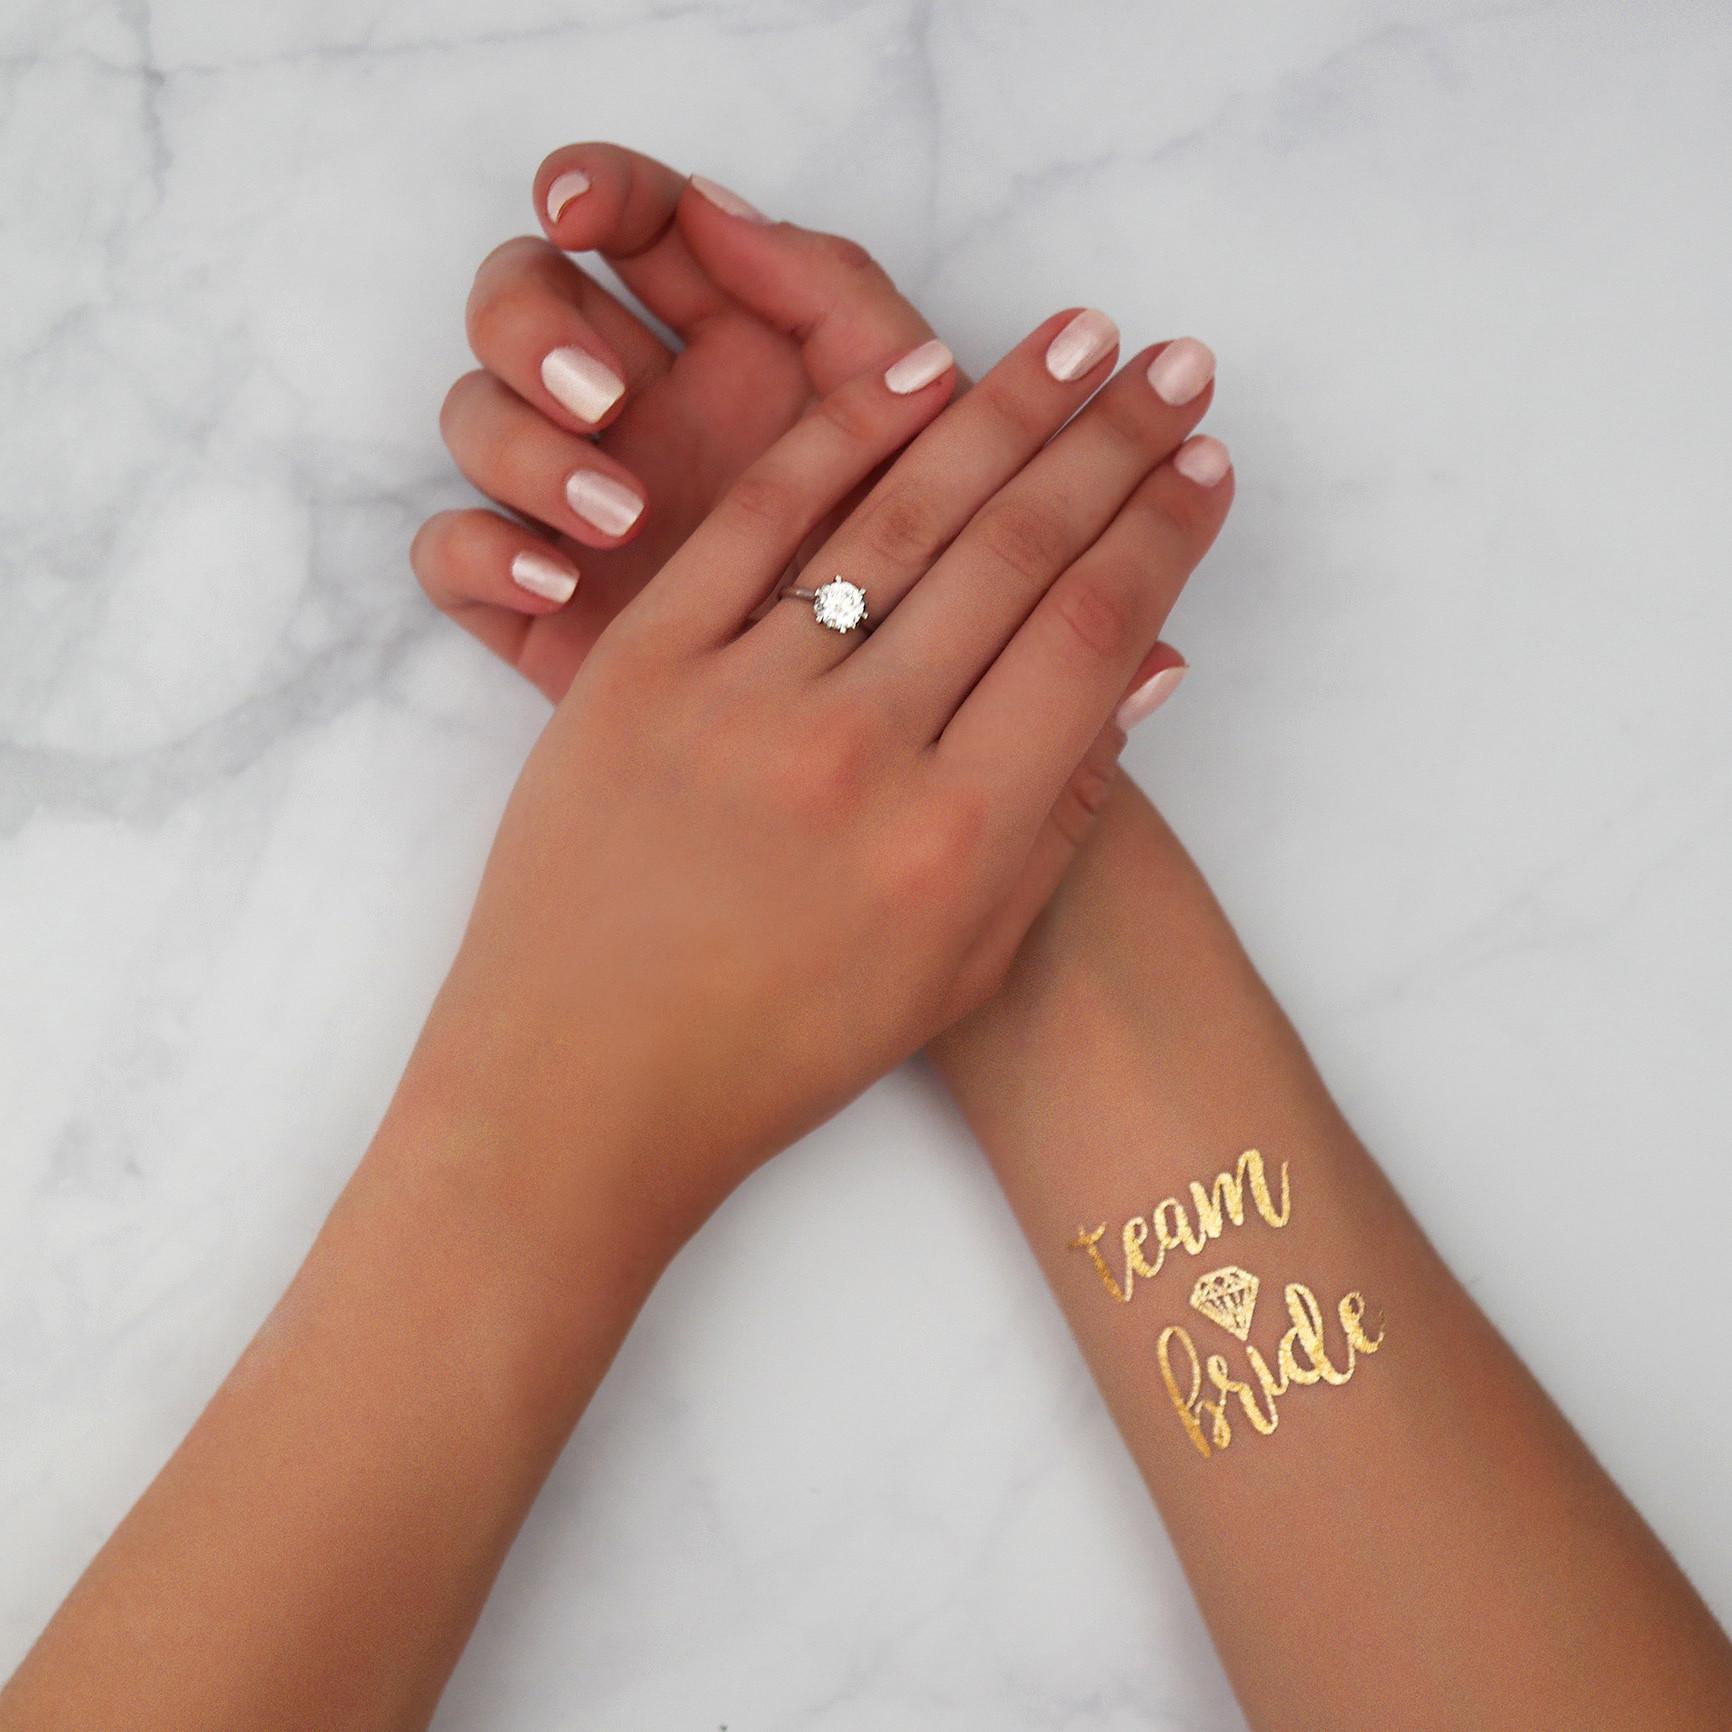 Tatouage Ephemere Team Bride Avec Diamant Oui Oui Bunny Mariage